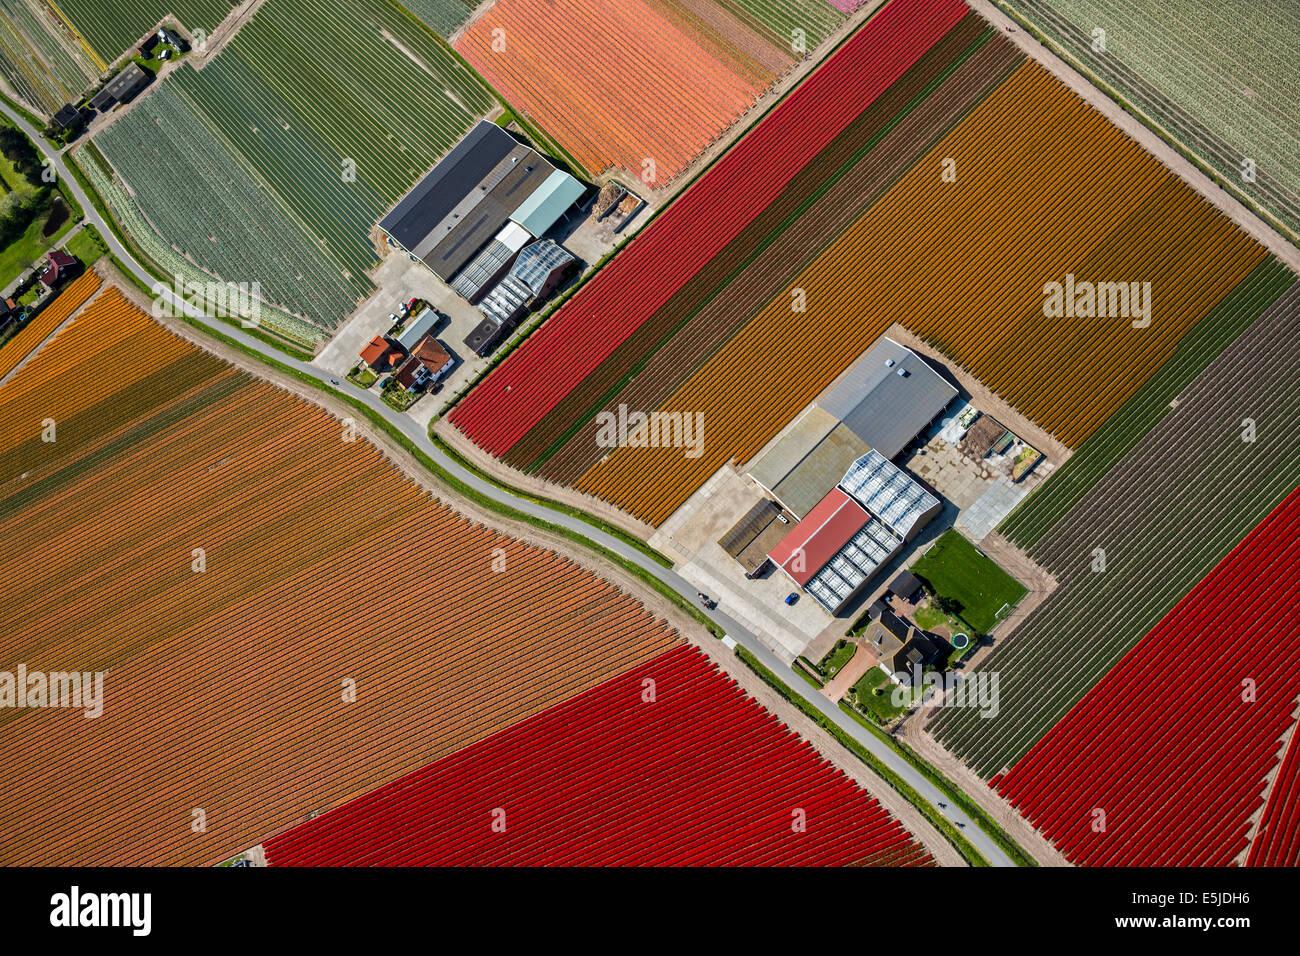 Holanda Egmond aan den Hoef Antena campos de tulipanes Imagen De Stock